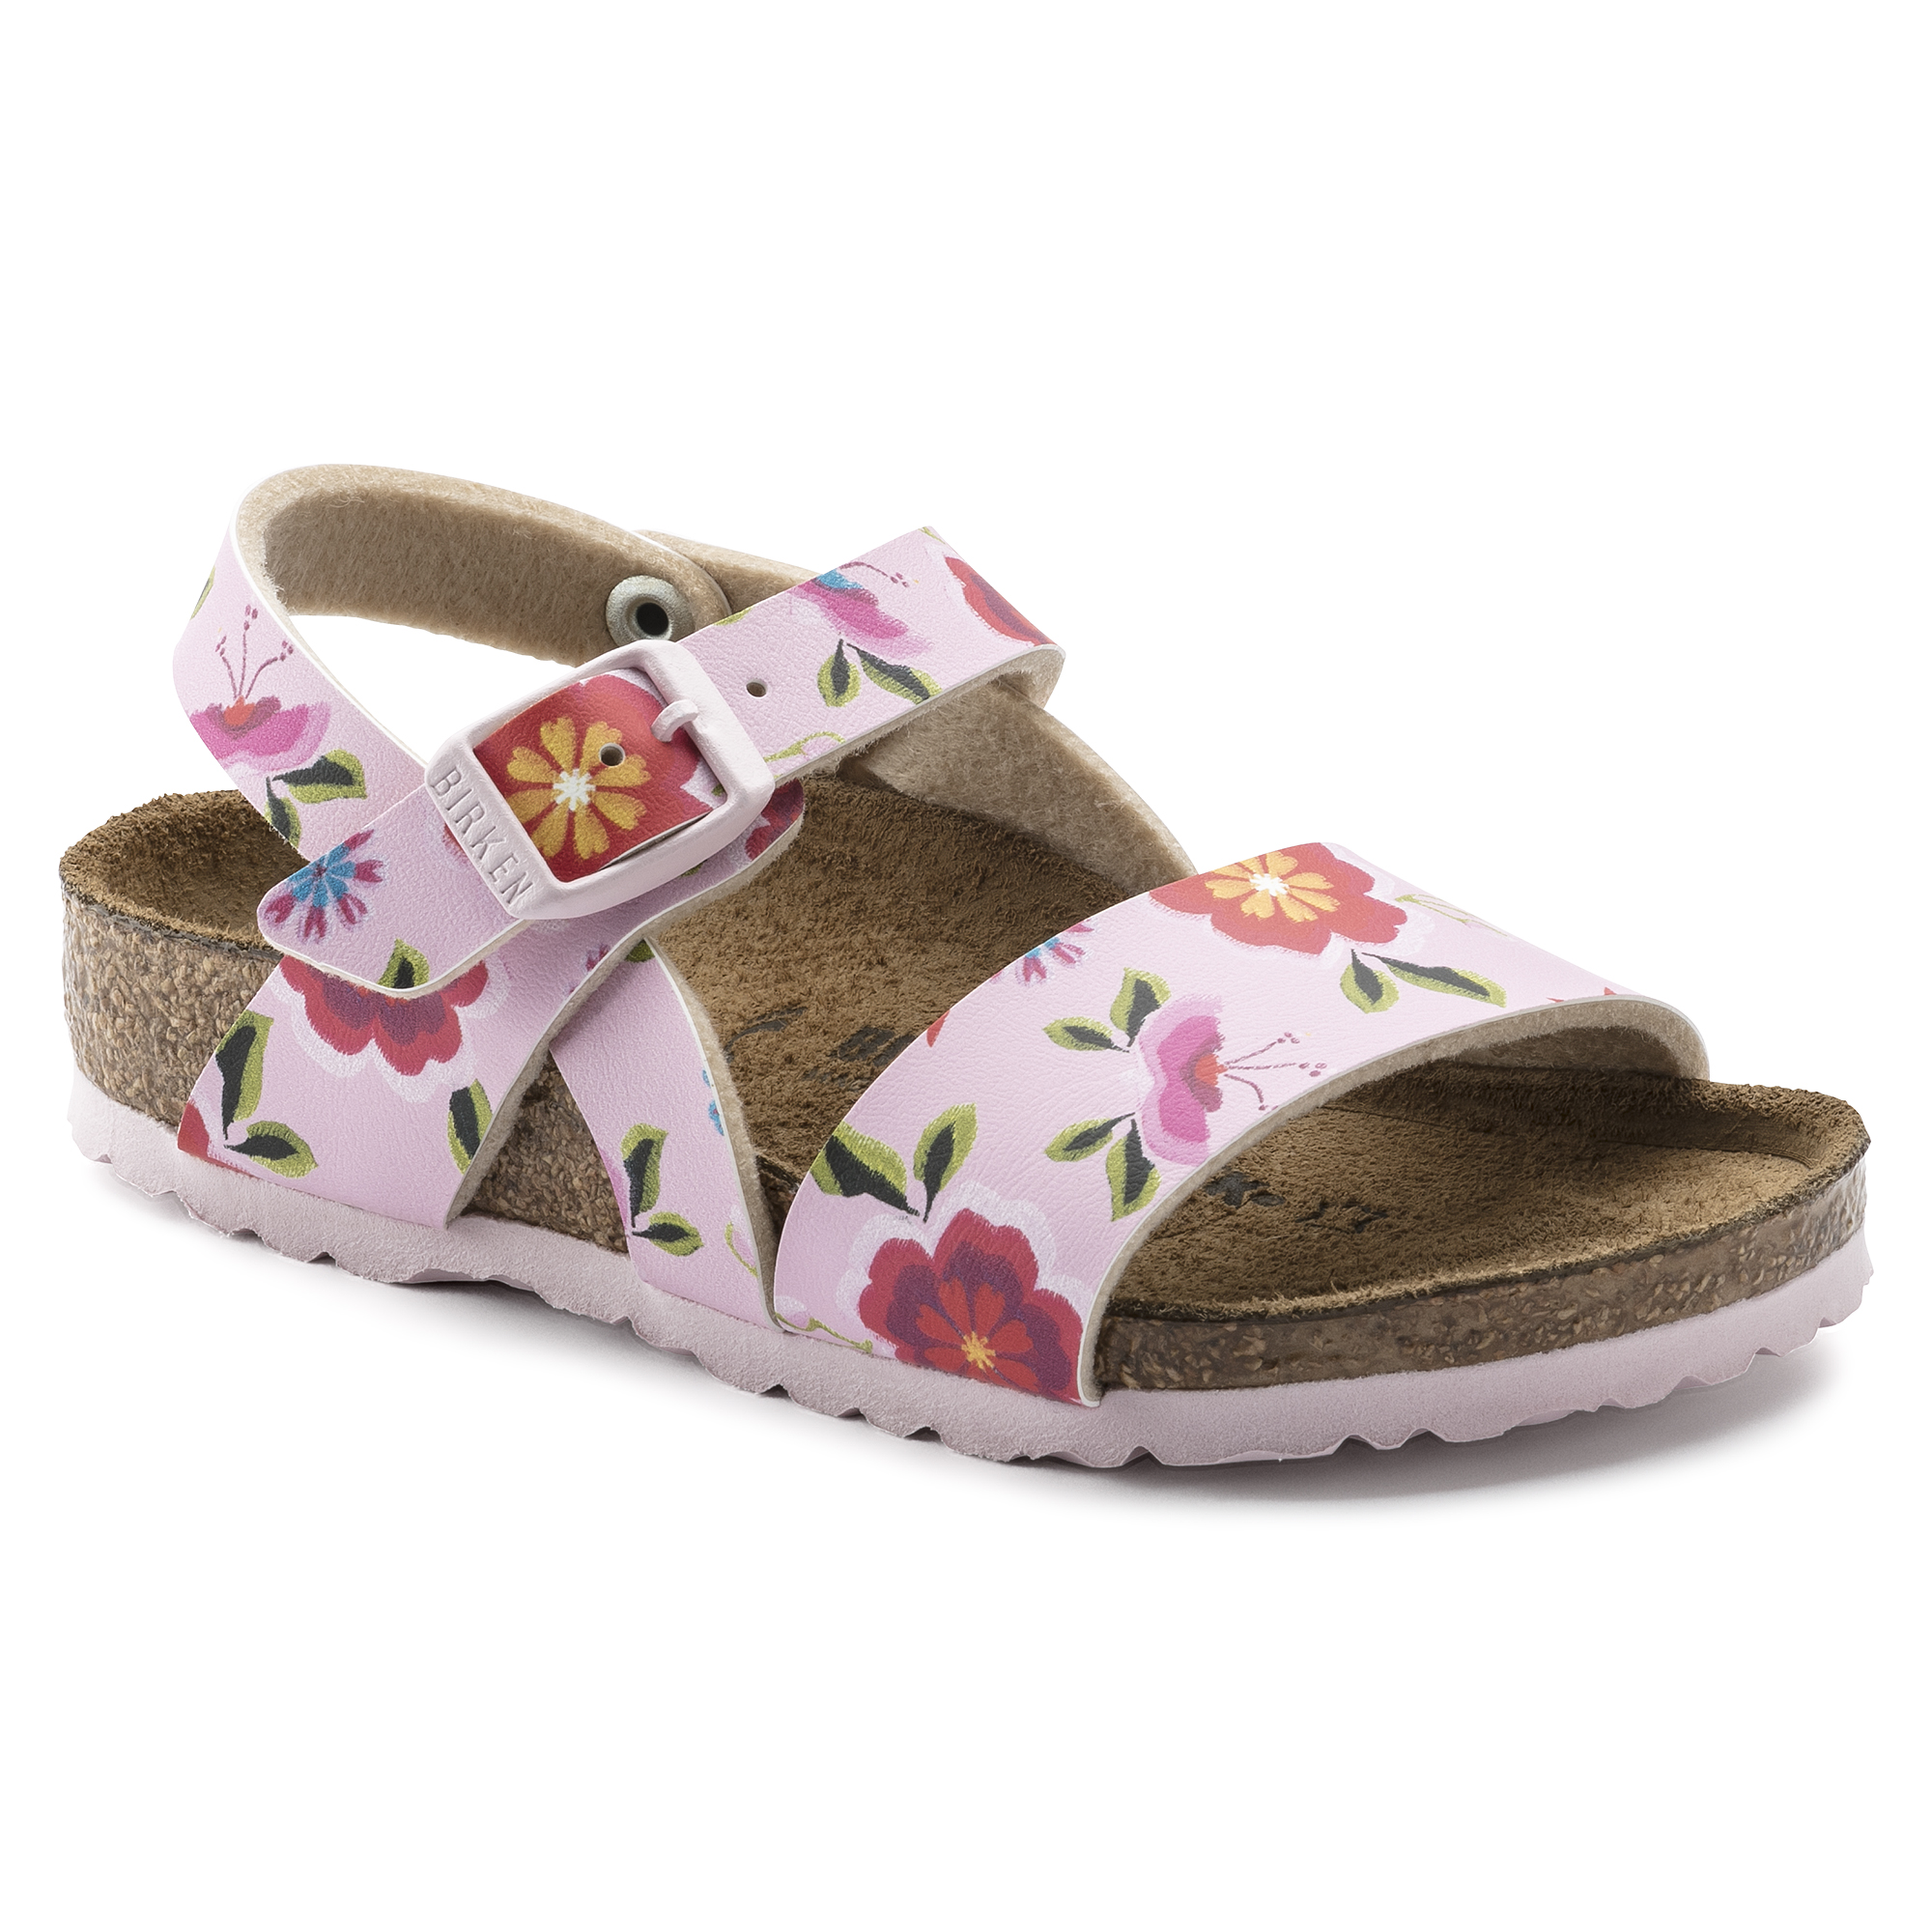 a77aafca9b31 Isabella Birko-Flor China Flowers Pink